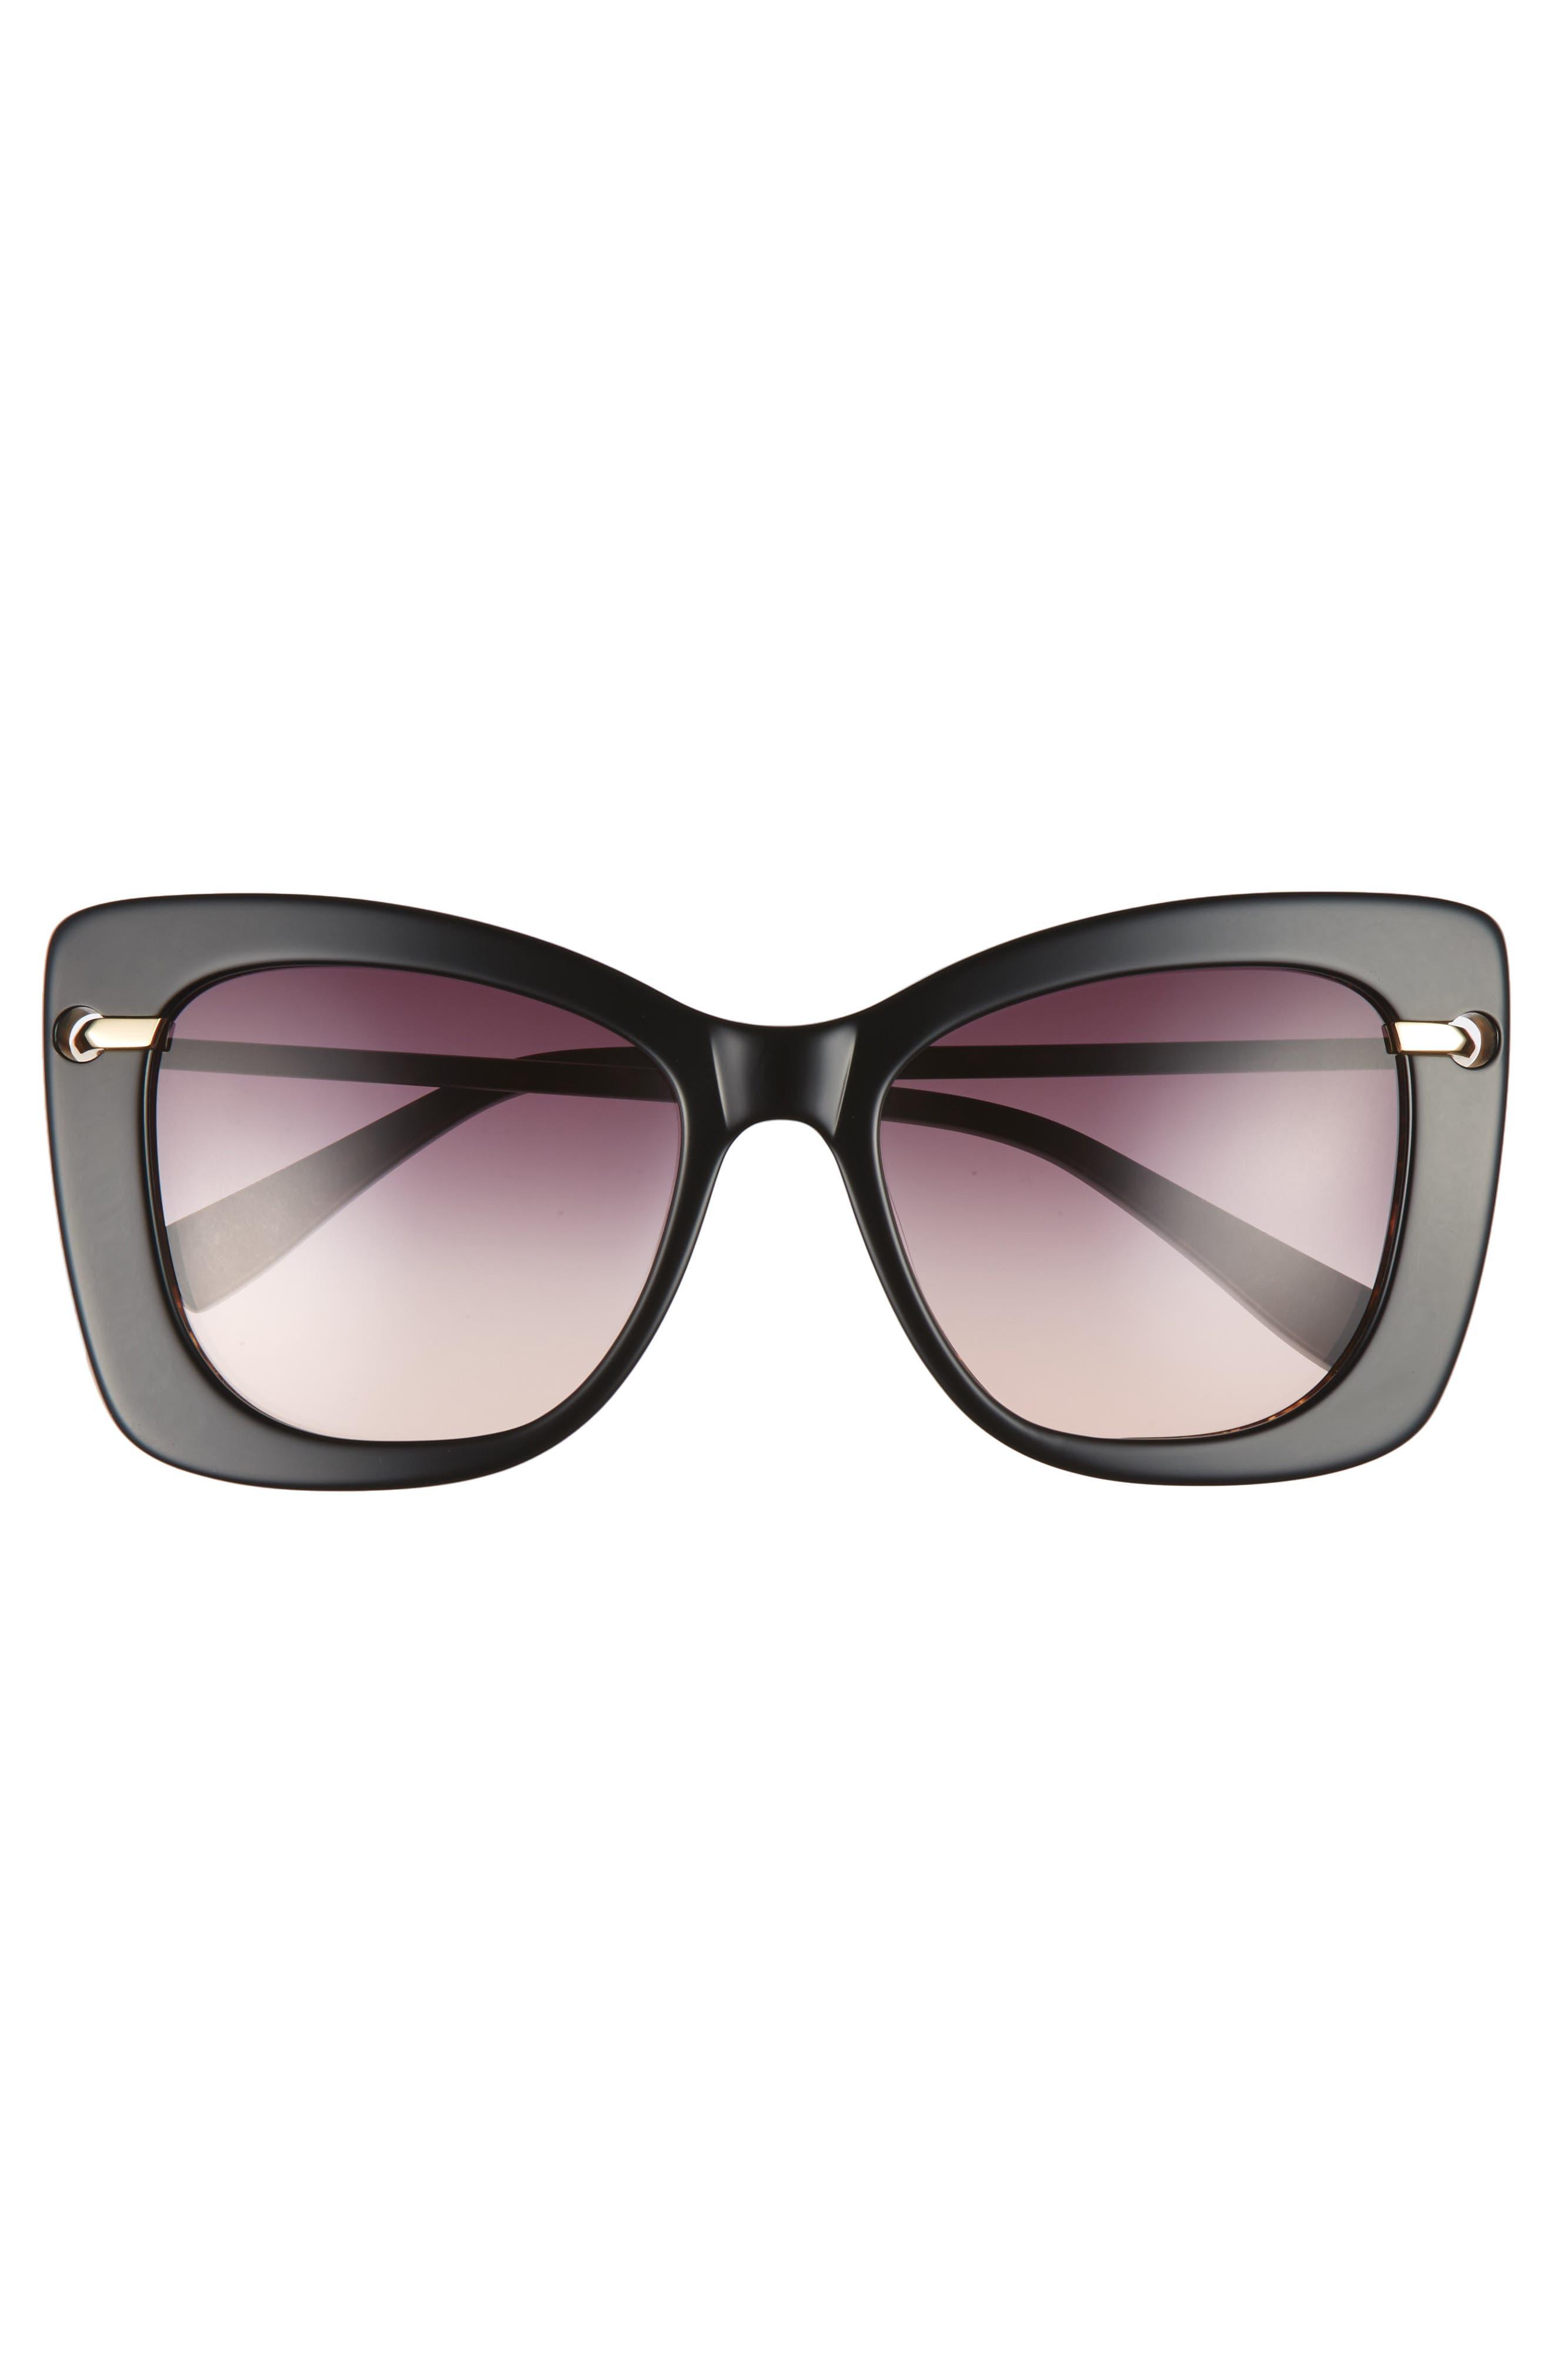 DEREK LAM,                             Clara 55mm Gradient Sunglasses,                             Alternate thumbnail 3, color,                             001